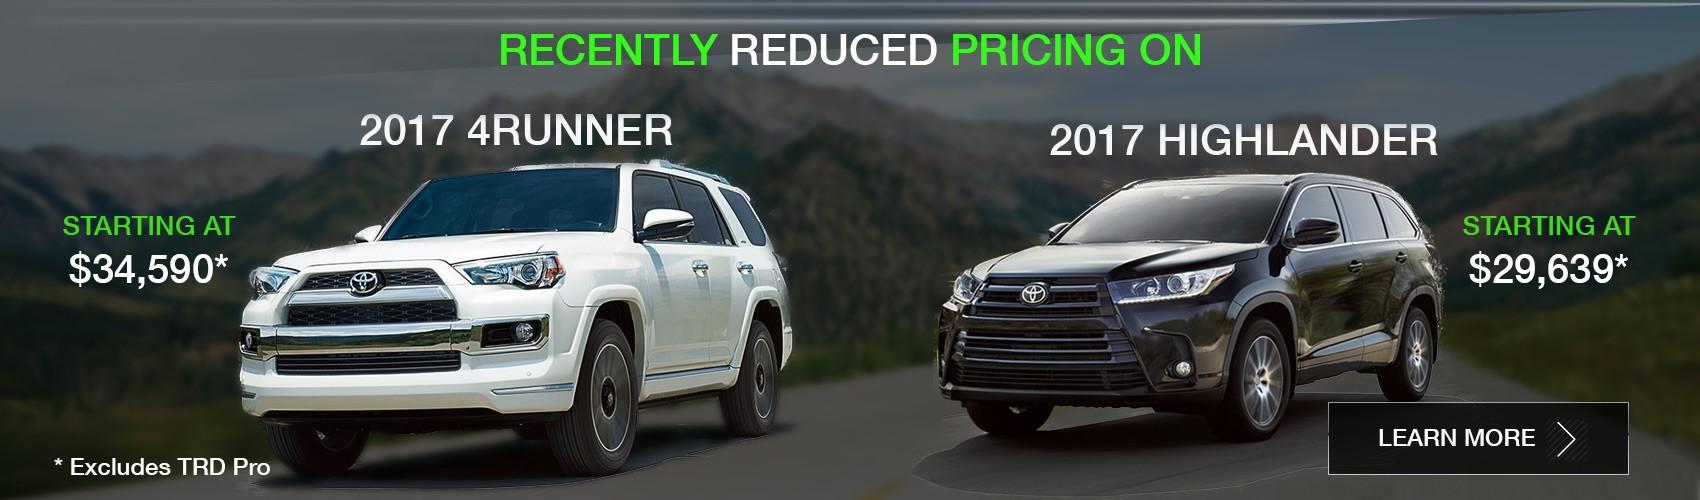 Toyotathon - Amazing deals at Beaverton Toyota